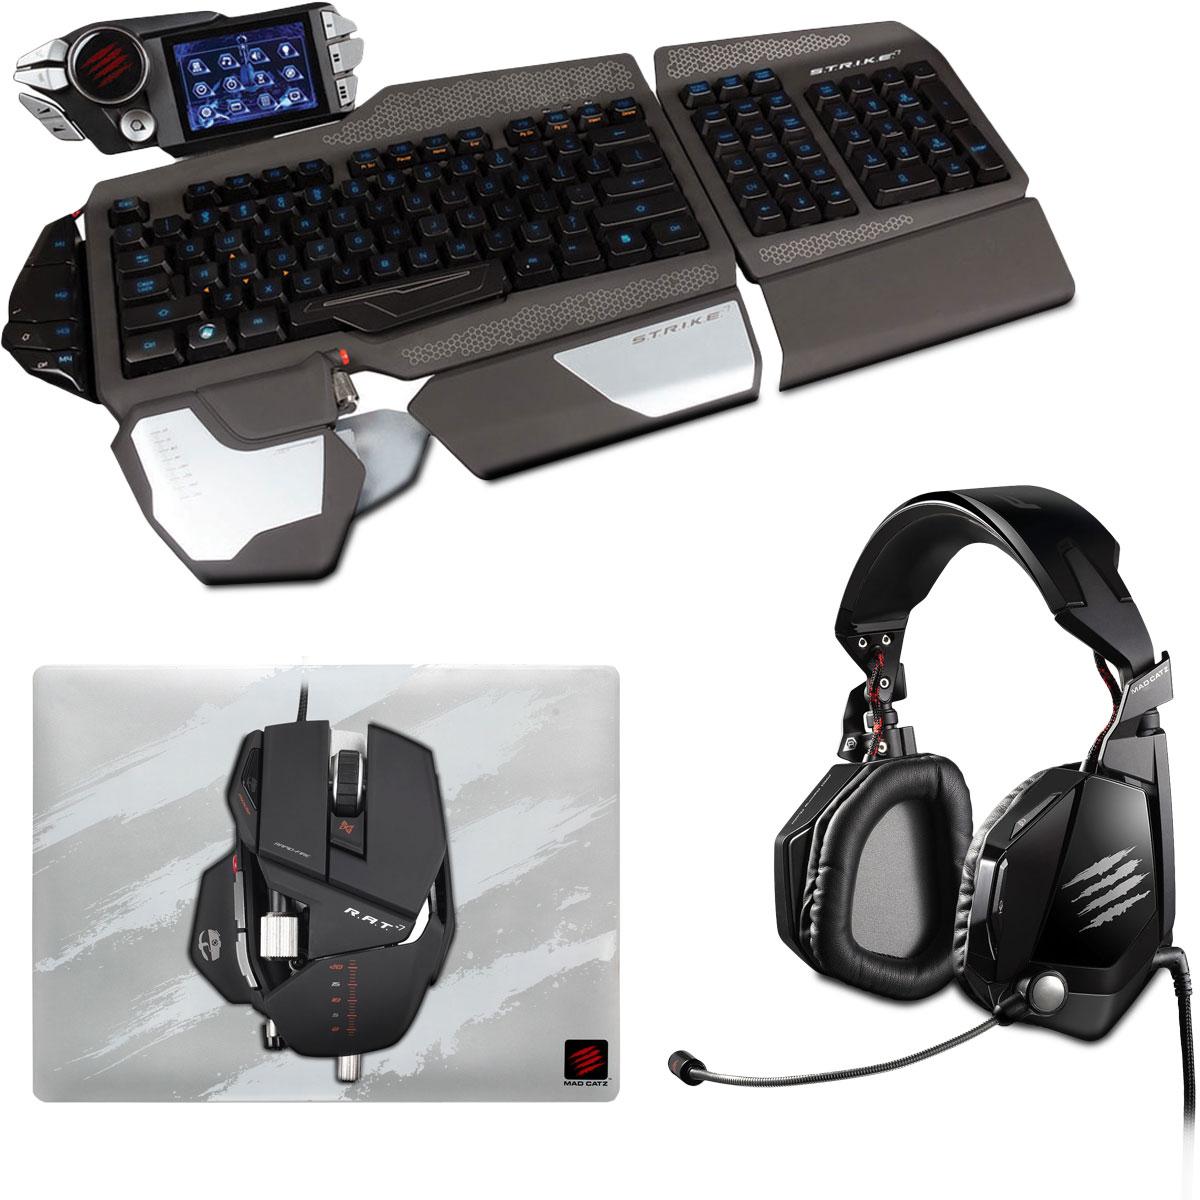 Mad catz s t r i k e kit 7 pack clavier souris mad catz sur - Grand tapis de souris gamer ...